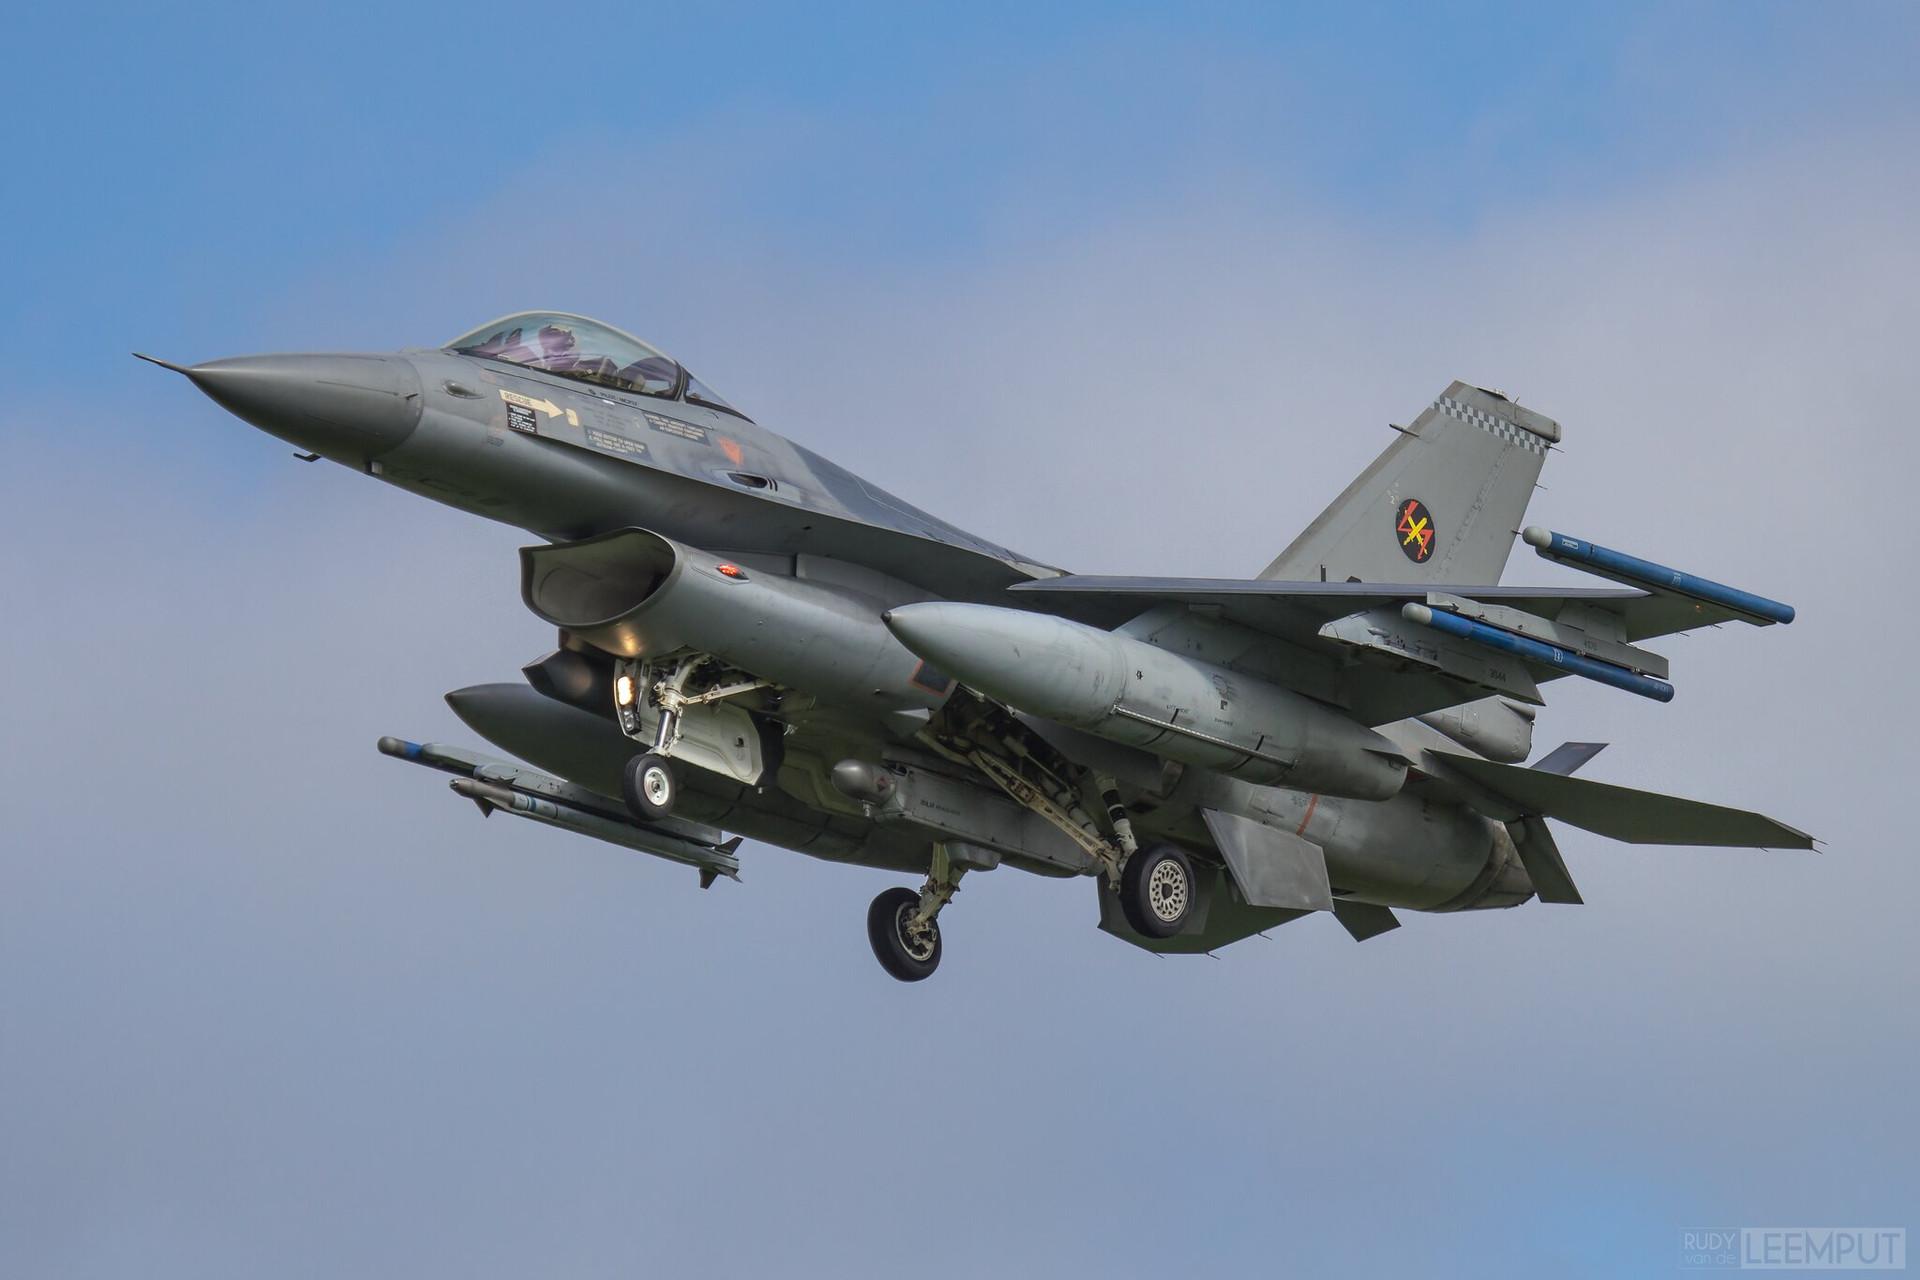 J-011   Build: 1991 - Lockheed F-16 A Fighting Falcon